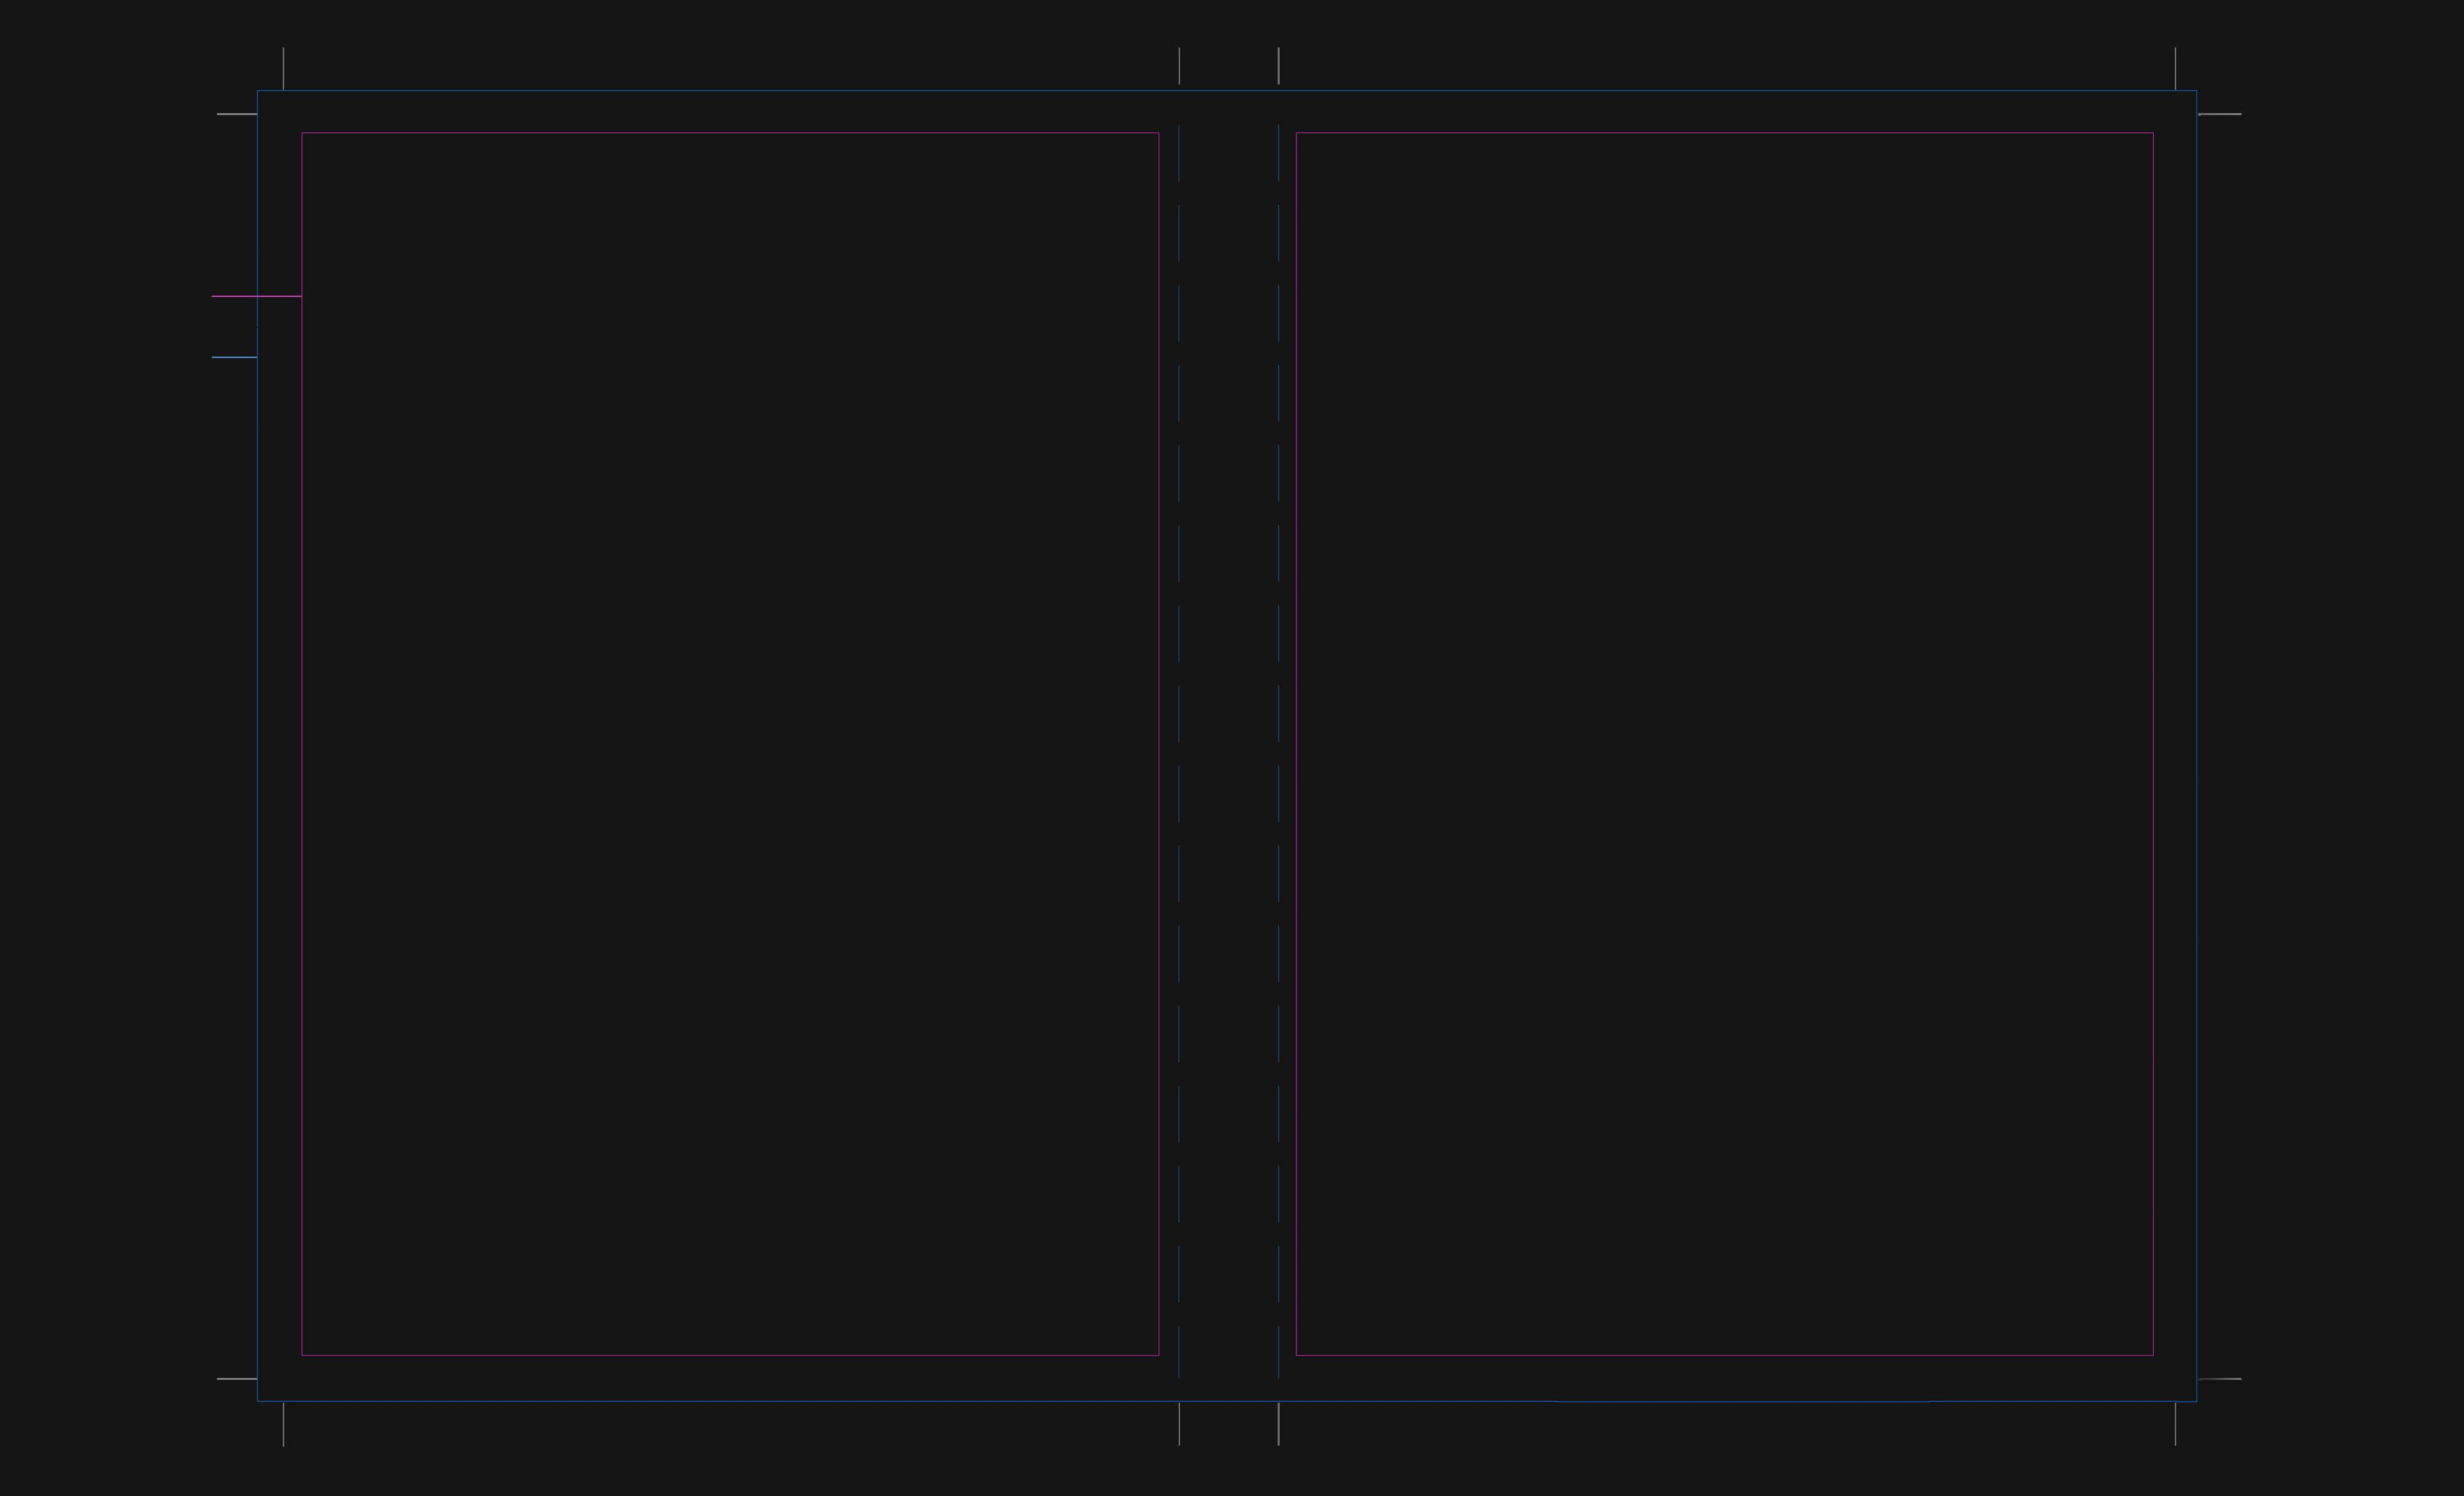 Memorex Dvd Case Inserts Template